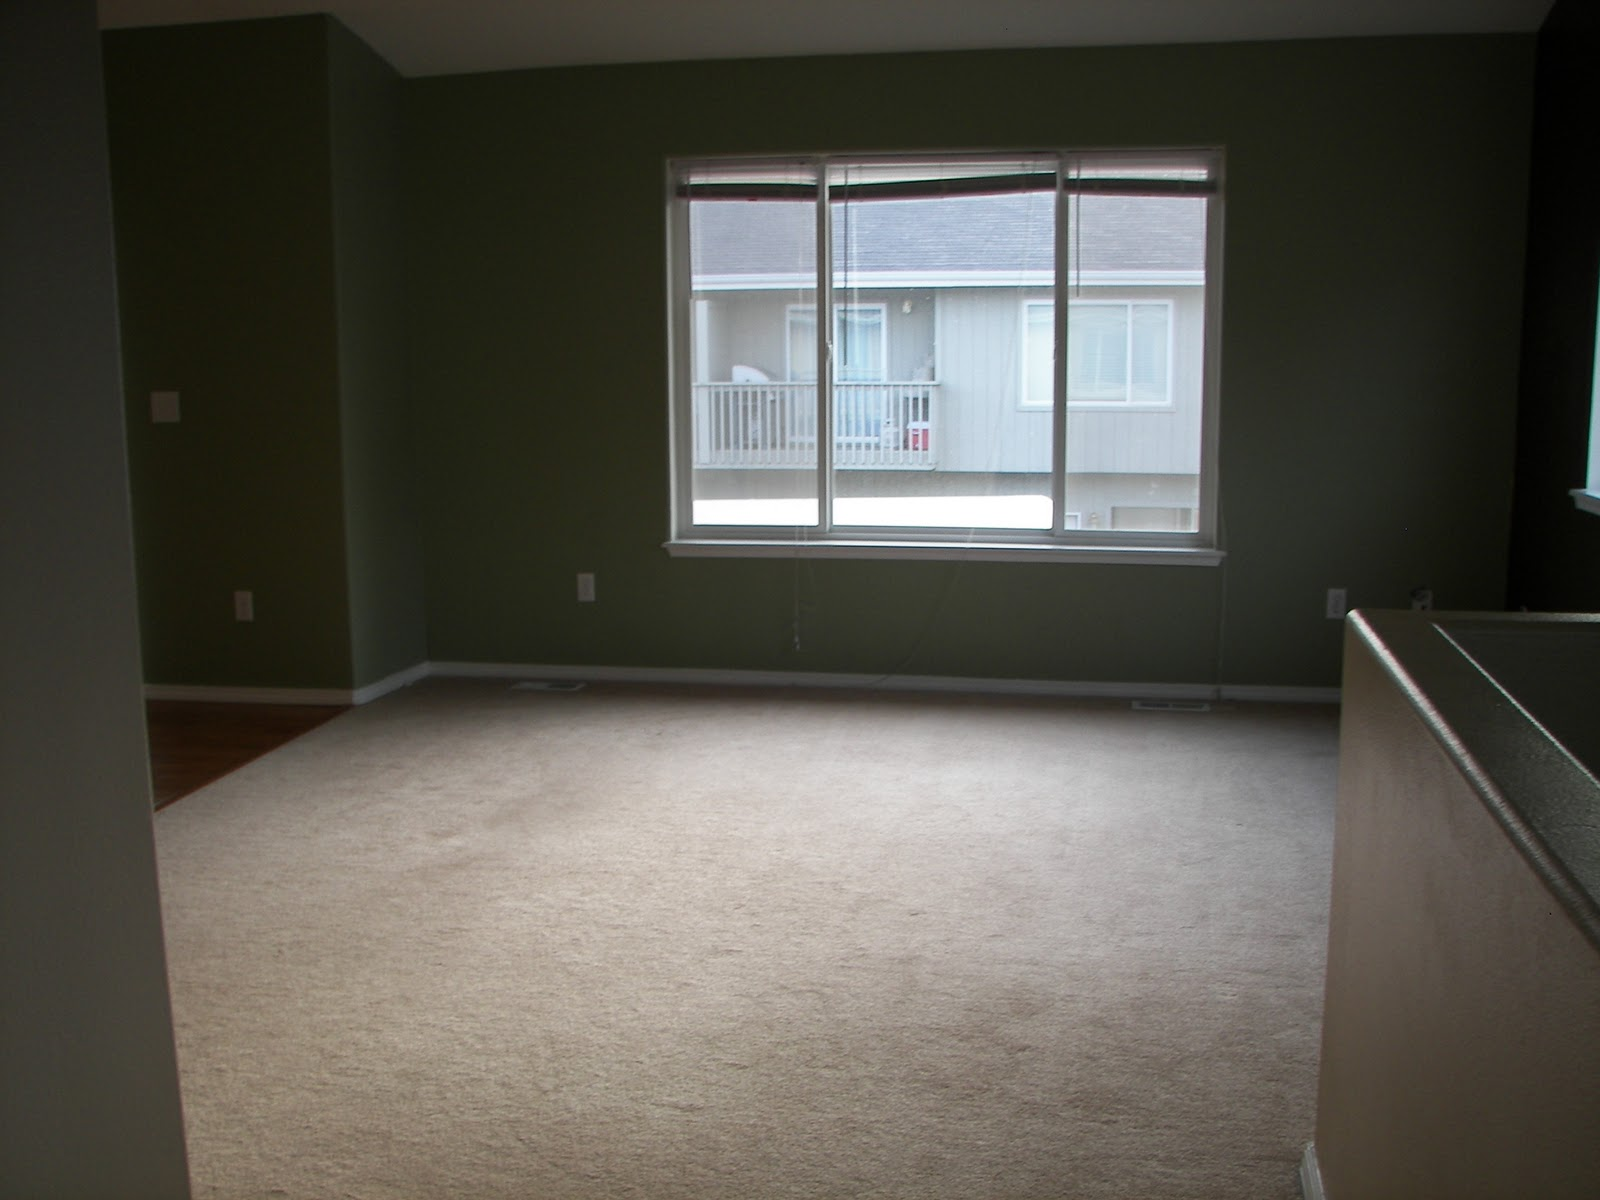 House designs school empty living room for Empty bedroom ideas